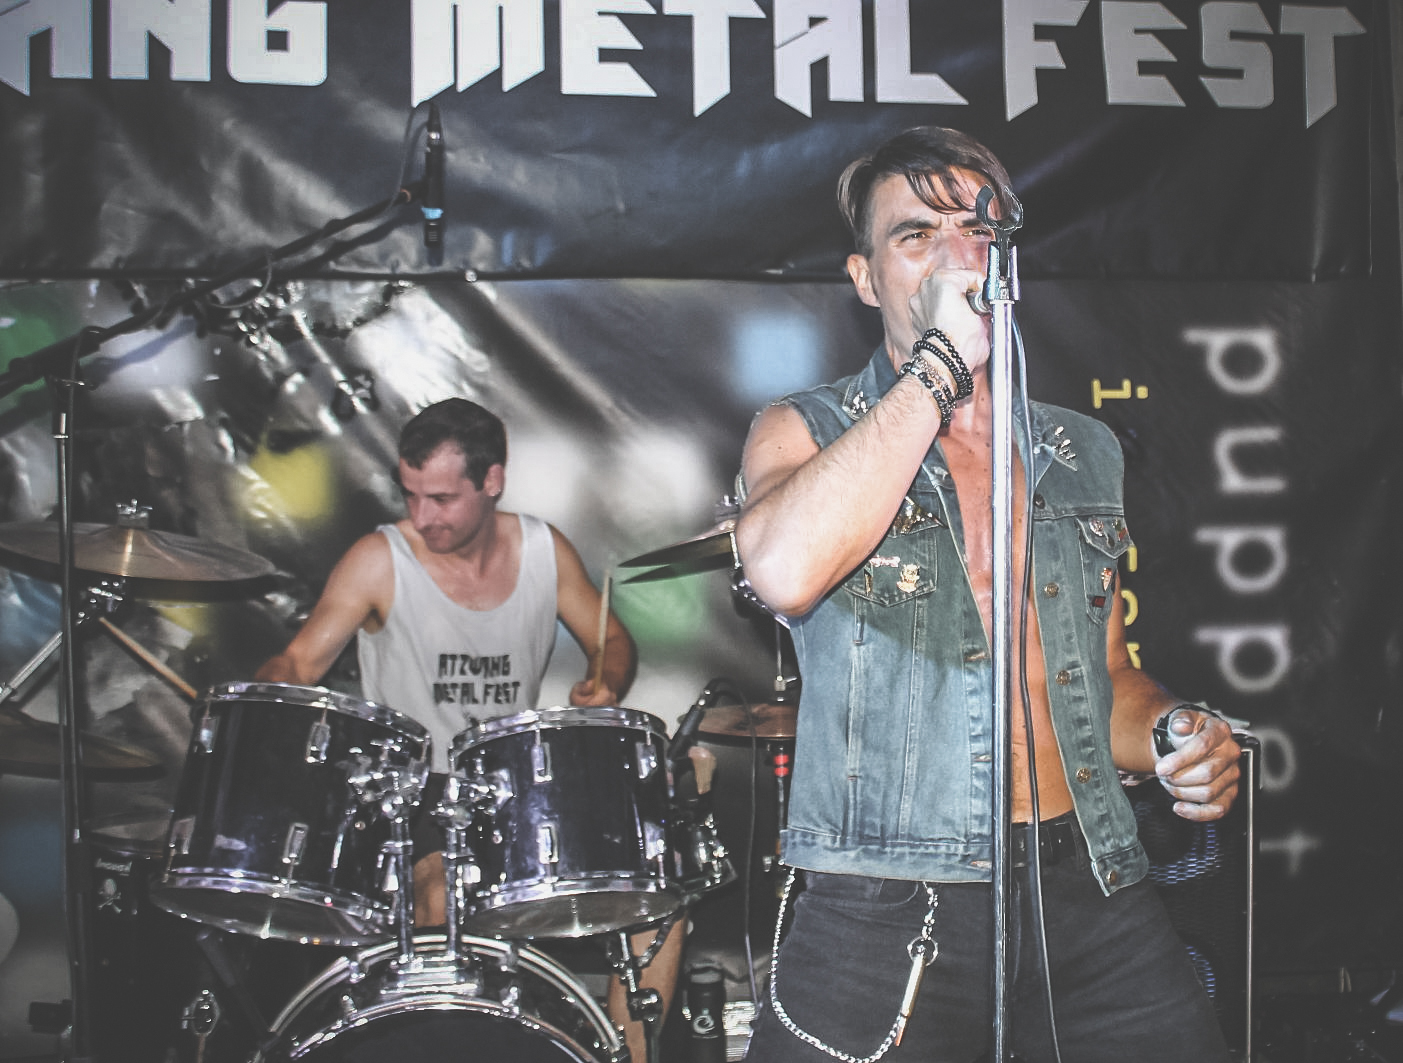 Anguish Force Atzwang Metal Fest 2019 19 - Atzwang Metal Fest 9 - live